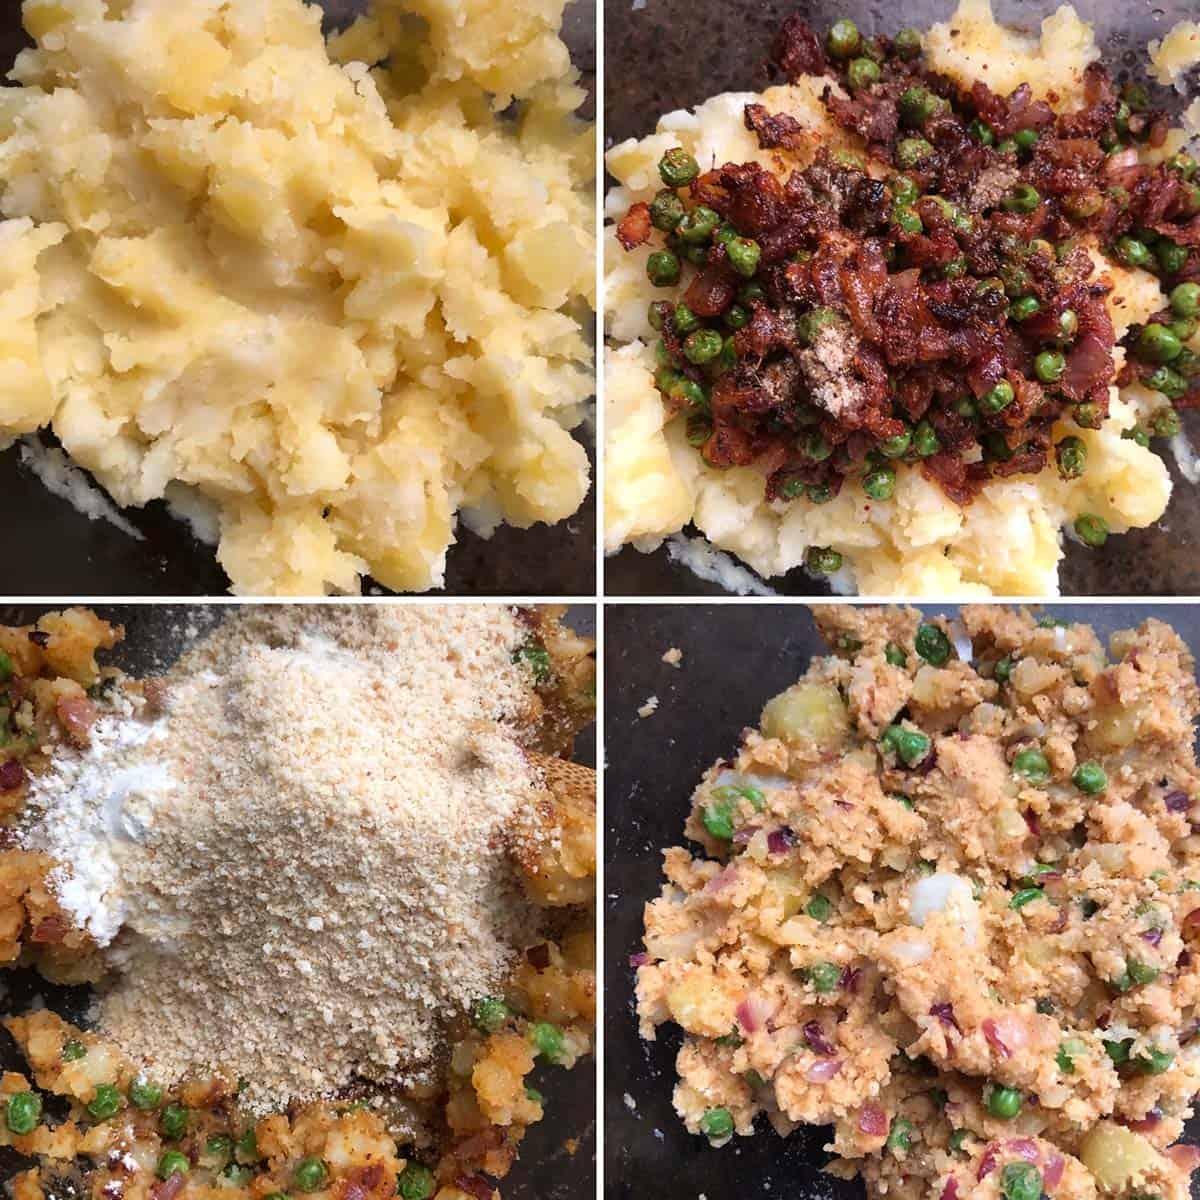 Adding mashed potatoes, bread crumbs to make potato patty mixture